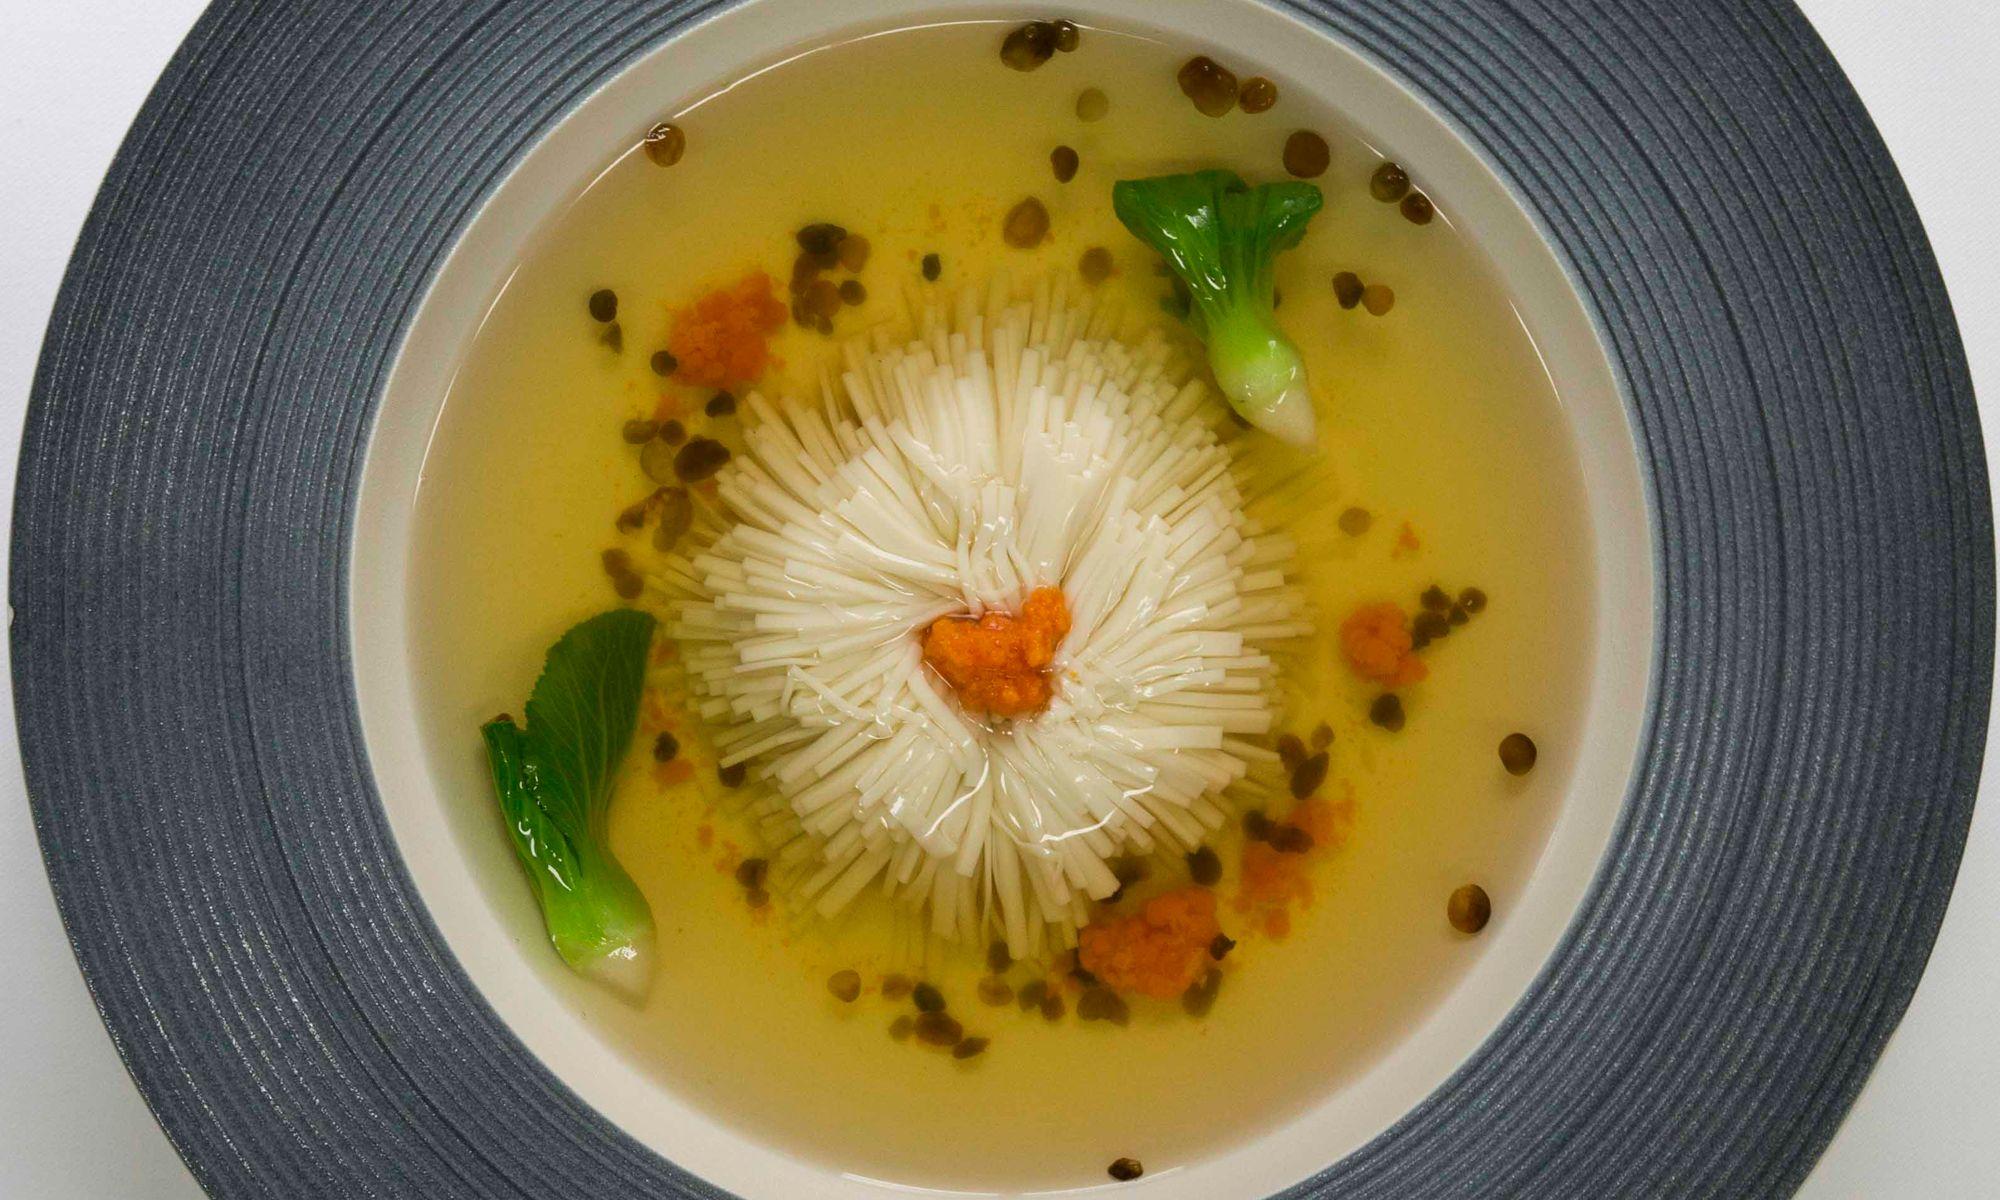 181115 Dish-Chrysanthemum 'thousand cut' silken tofu in chicken broth..jpg